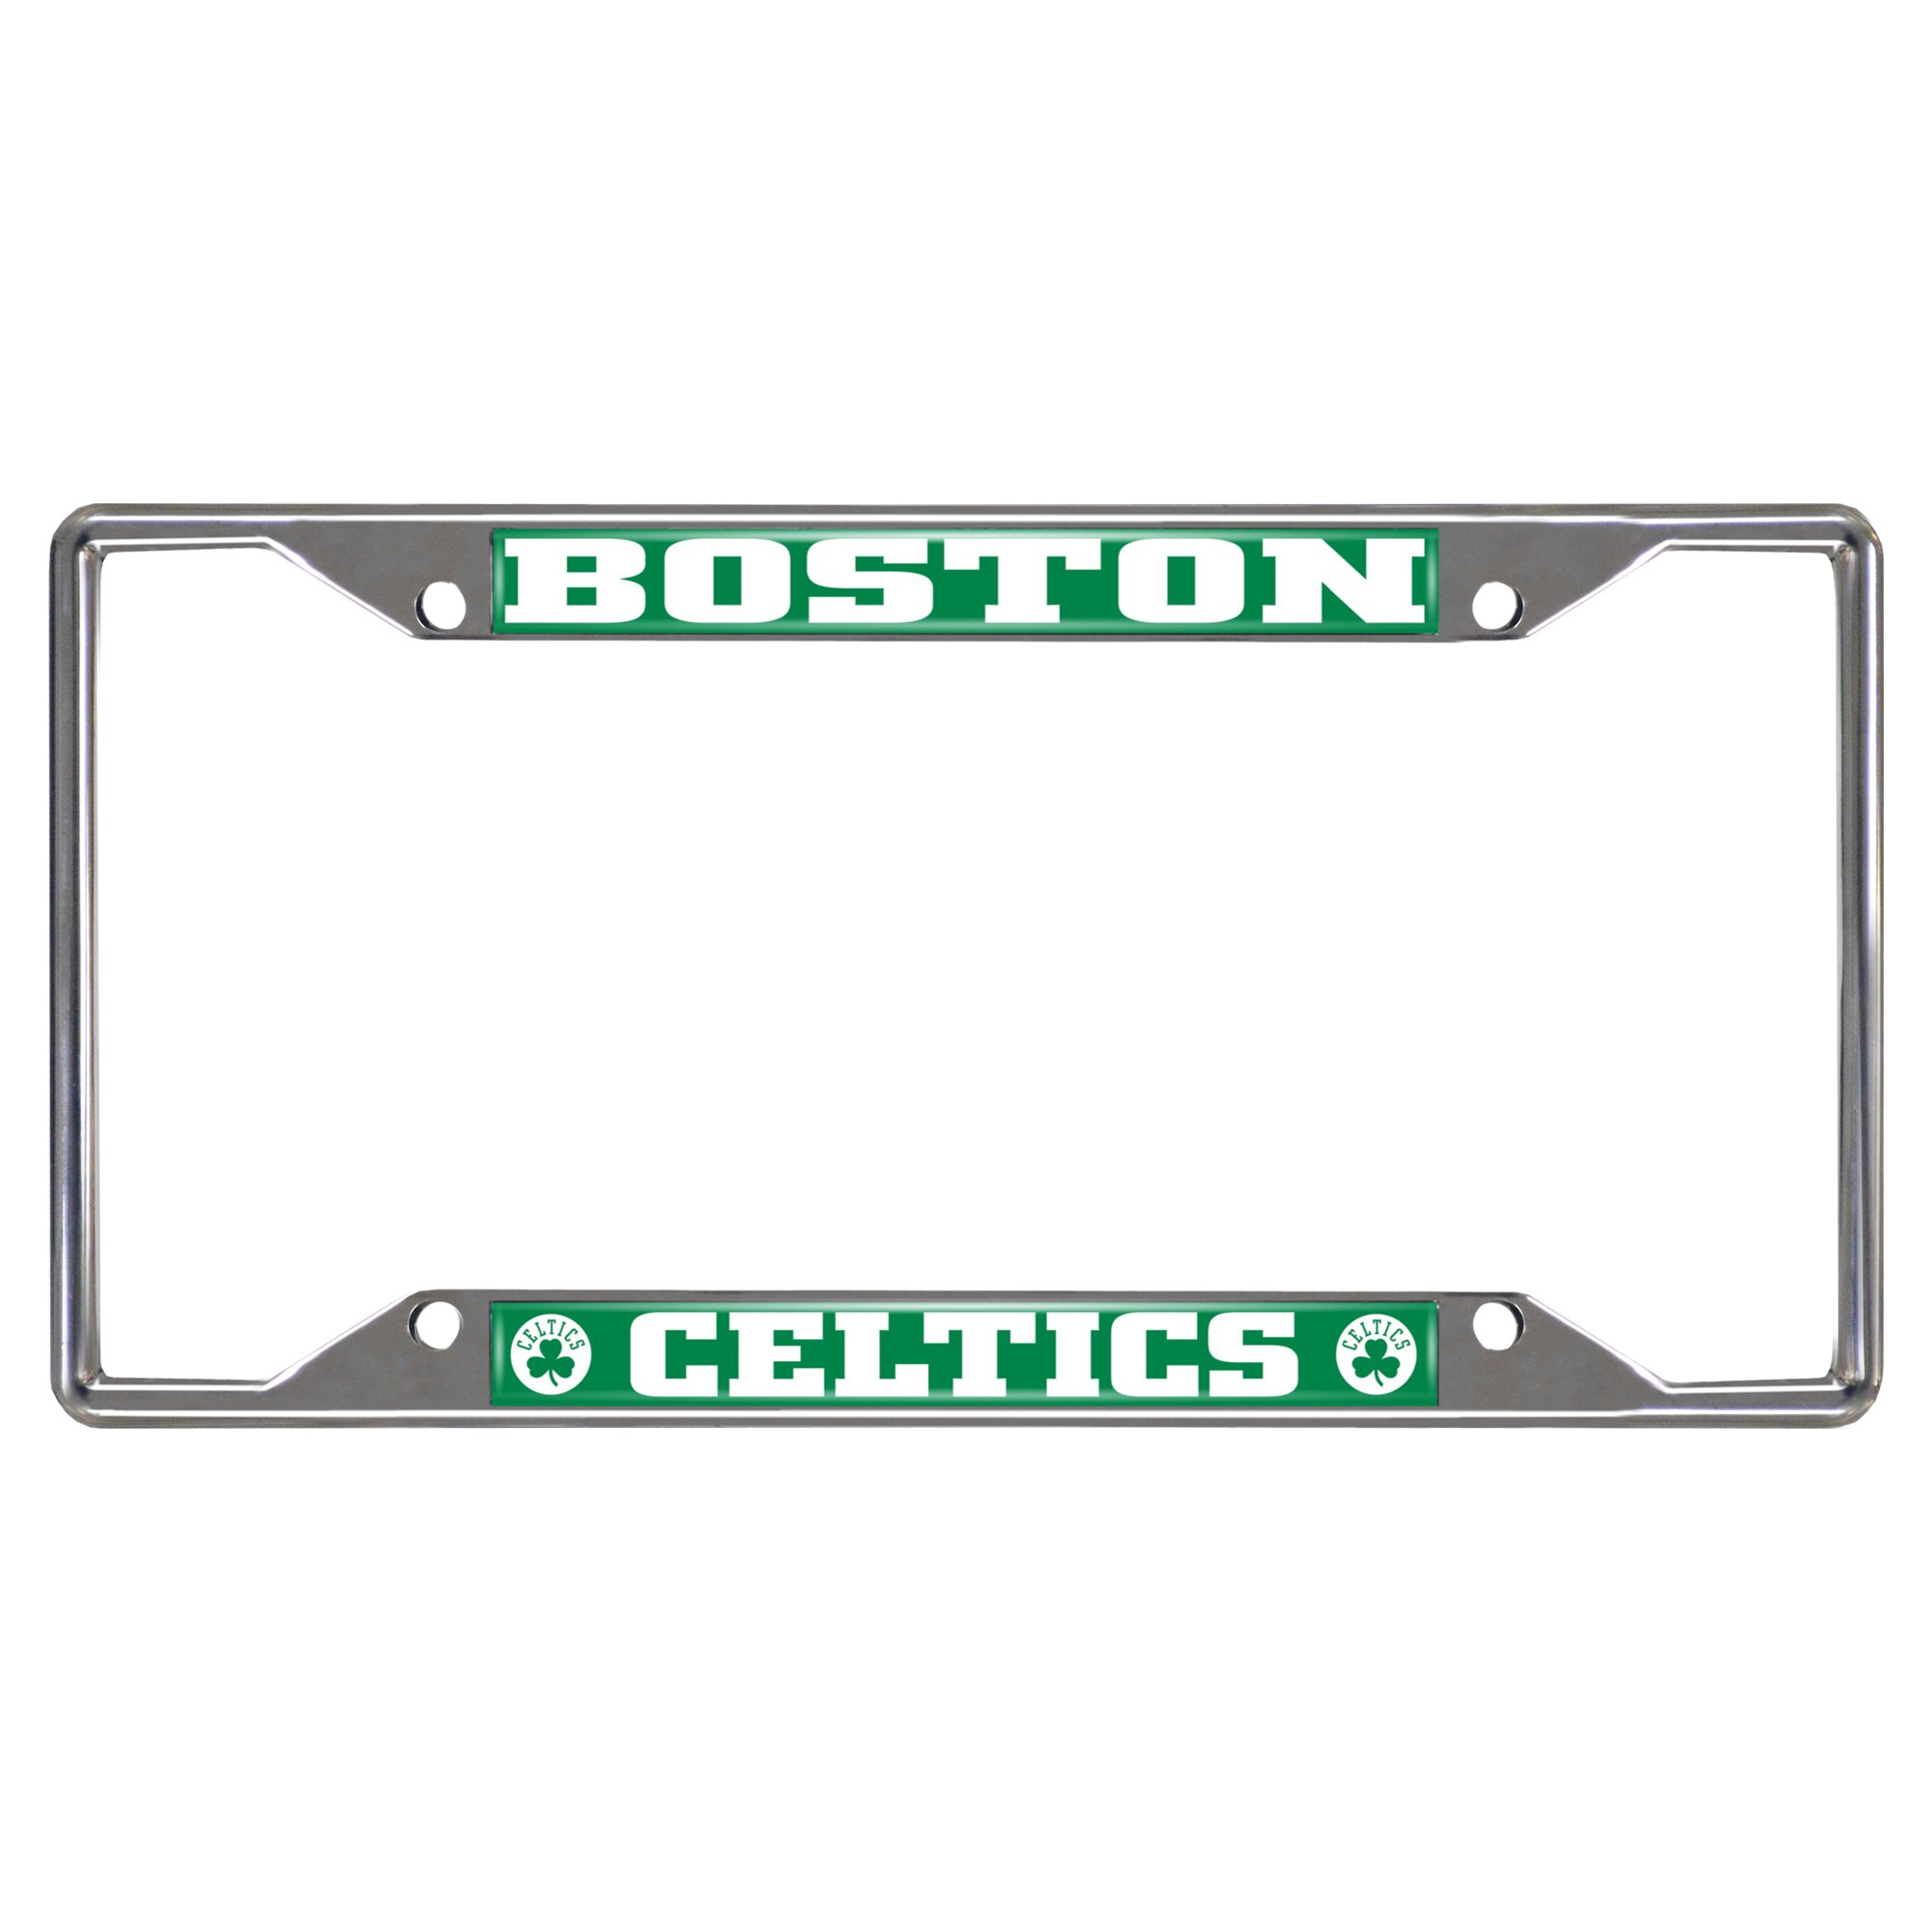 Fanmats  14839 NBA Boston Celtics Chrome License Plate Frame